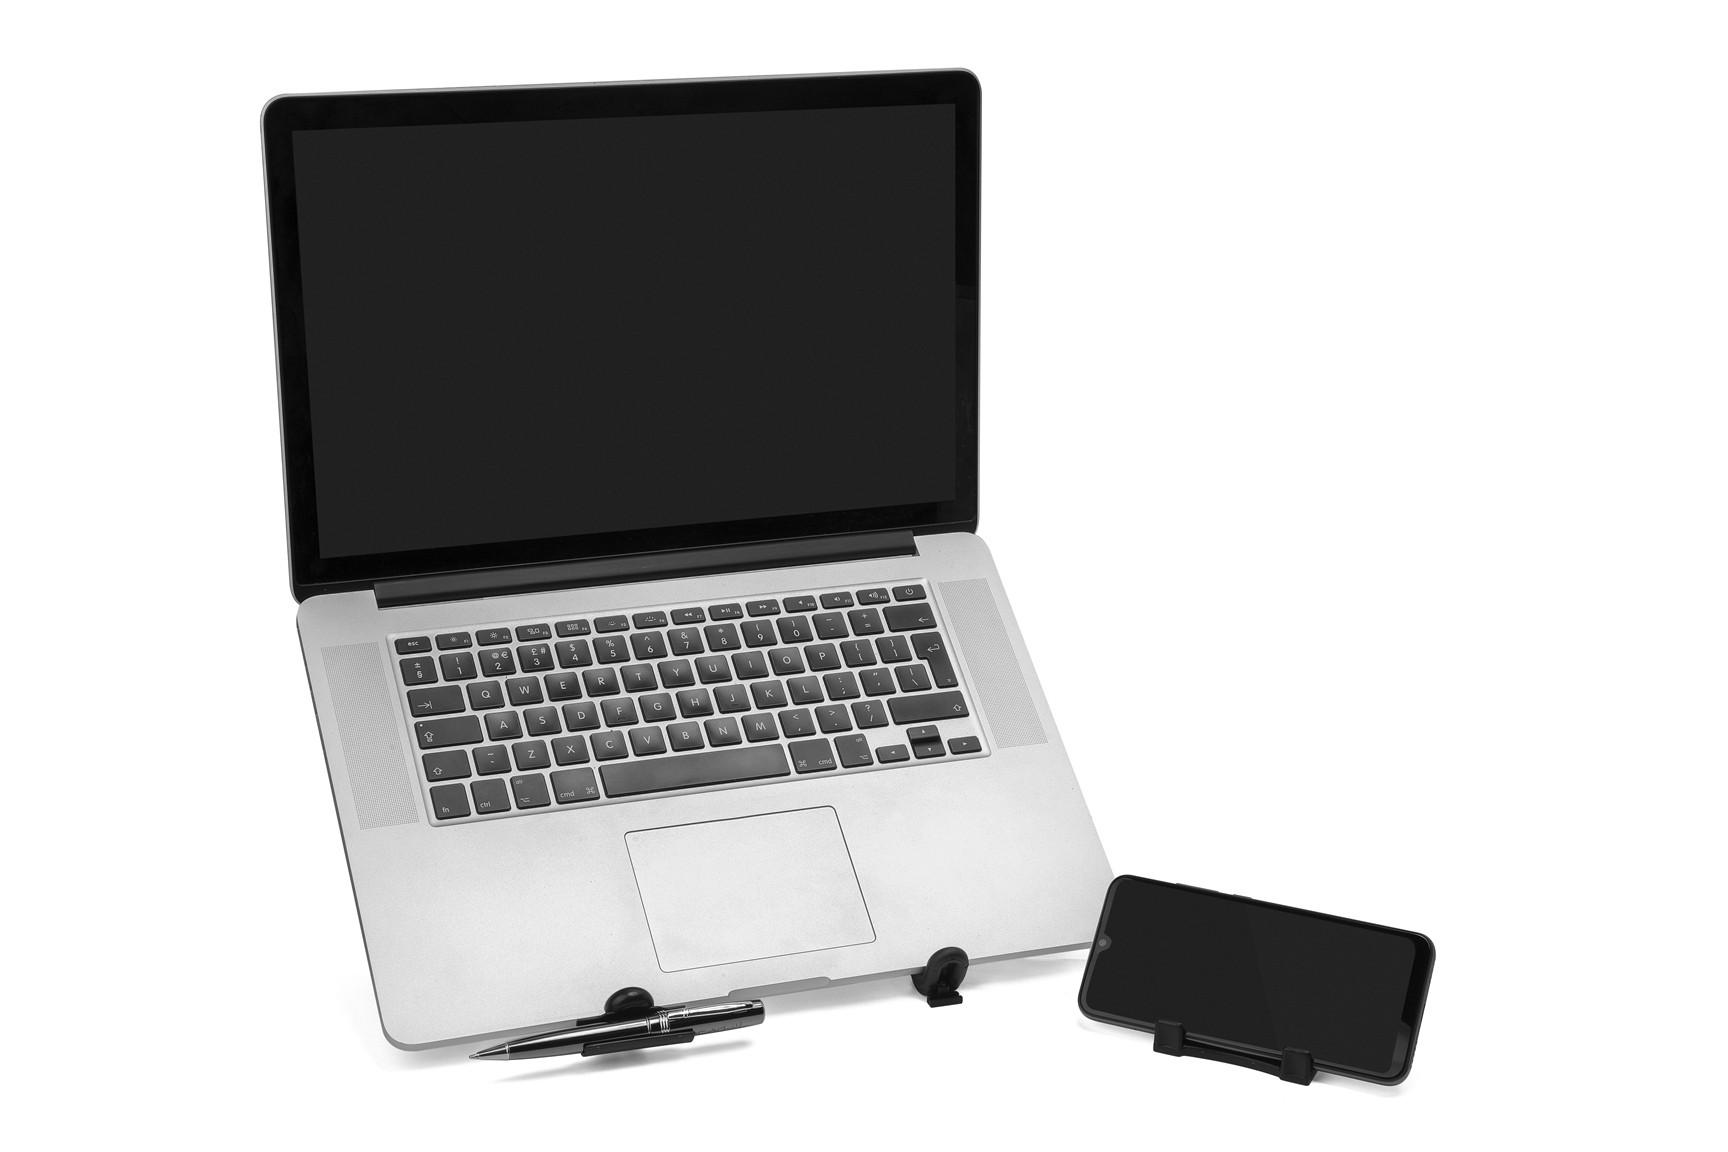 Kit 5 Suporte Universal Para Notebook Netbook Tablet Ergonômico